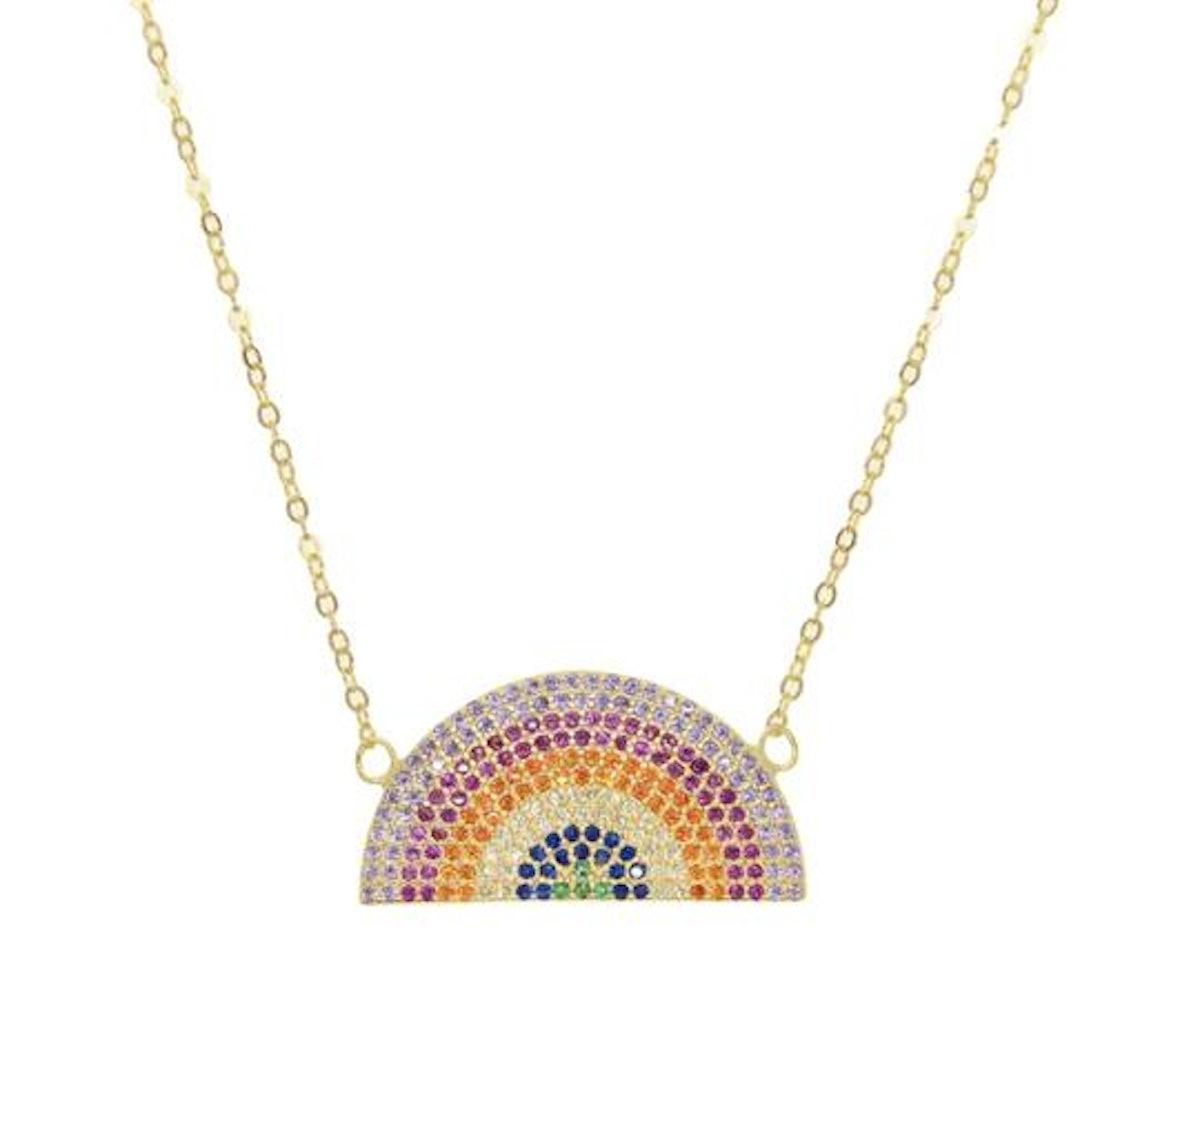 Rainbow Pave Necklace